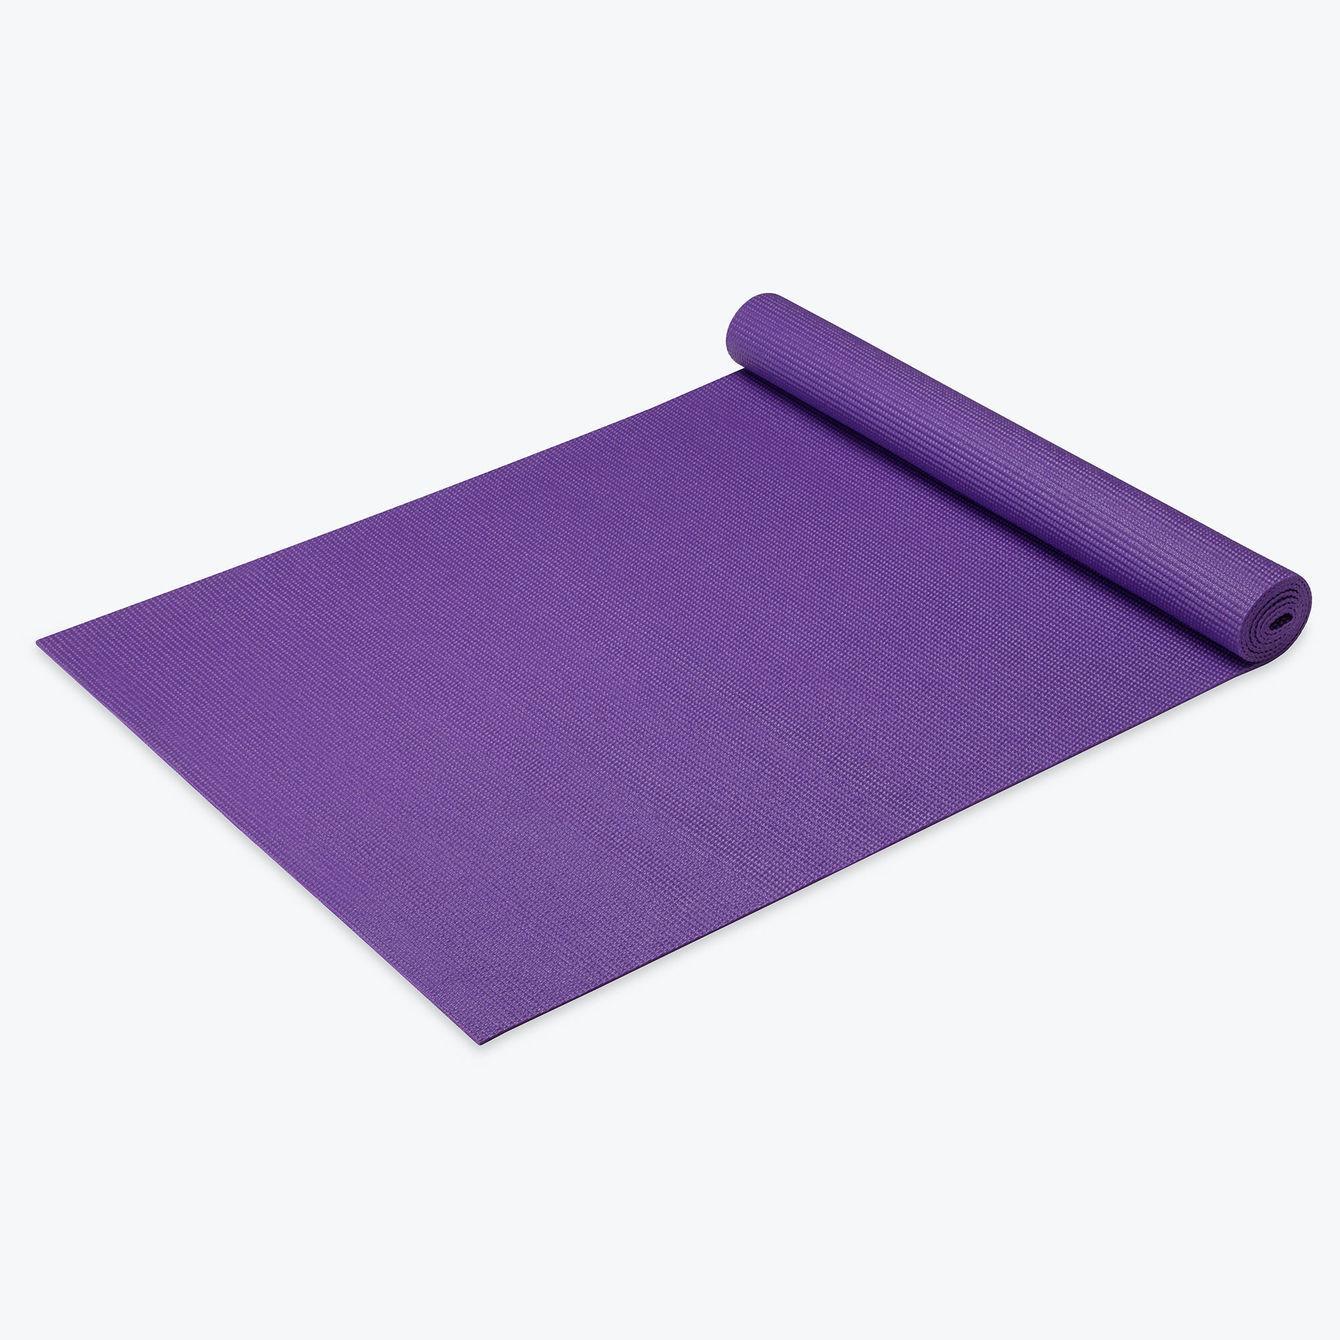 Gaiam 3mm Yoga Mat Purple